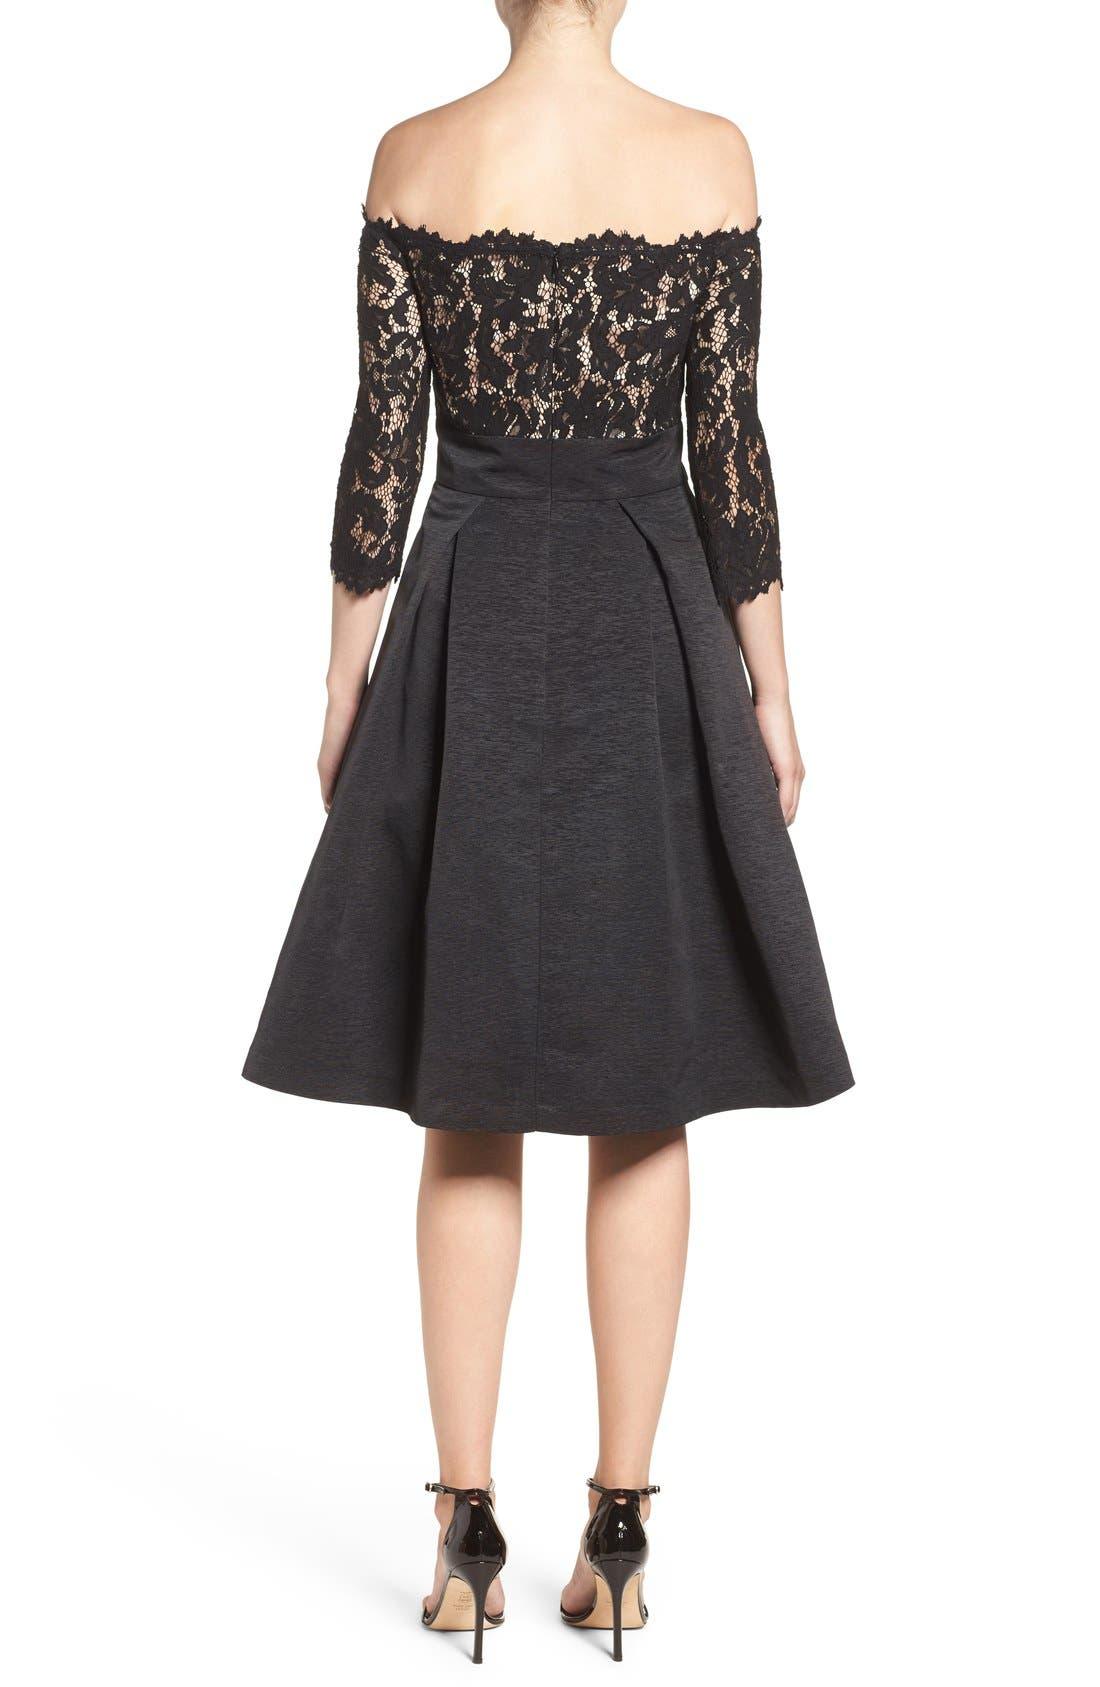 Off the Shoulder A-Line Dress,                             Alternate thumbnail 12, color,                             BLACK